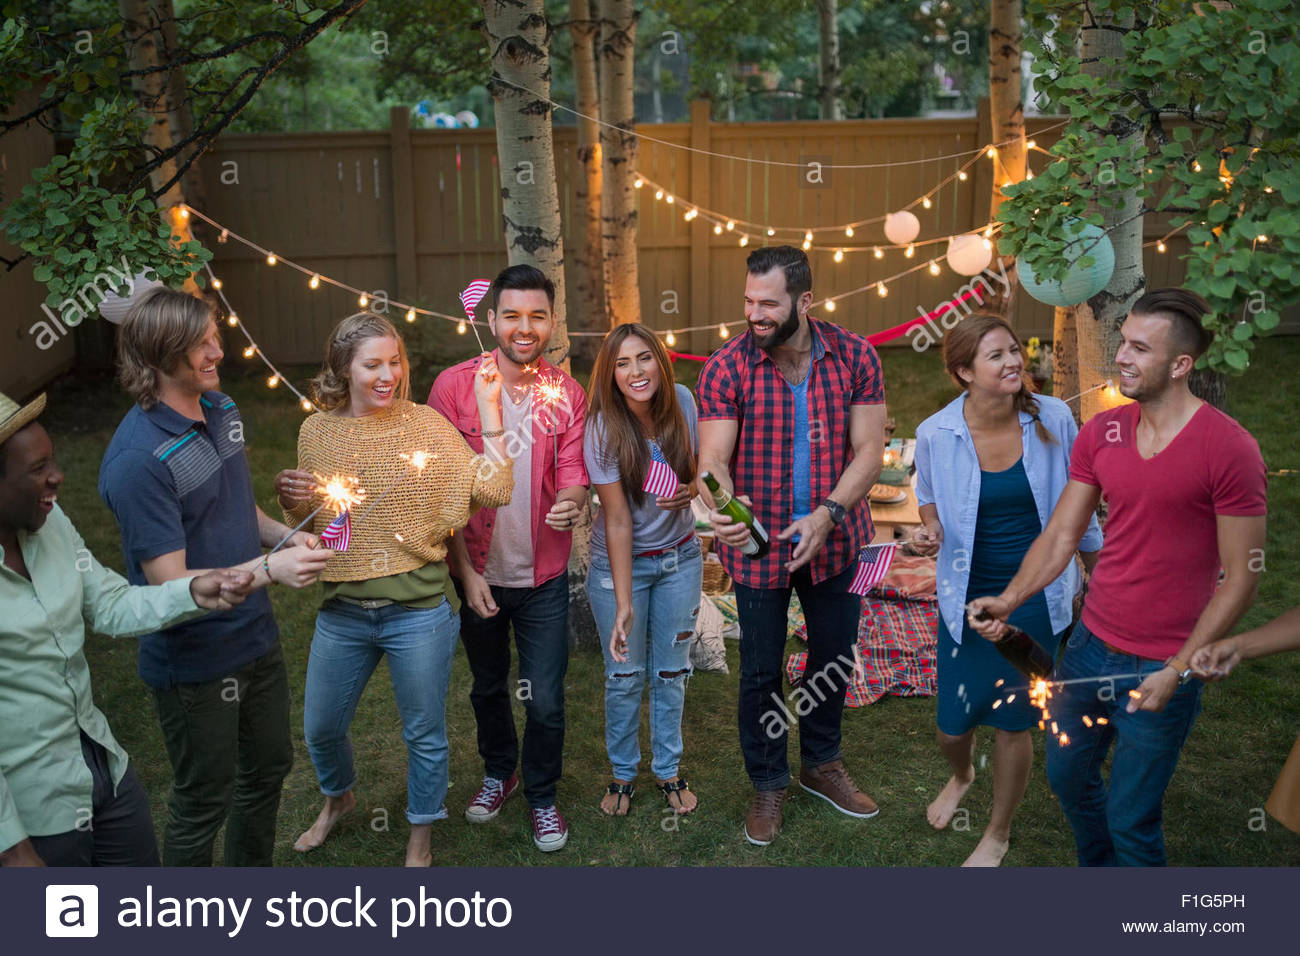 Amigos con estrellitas en patio parte Imagen De Stock